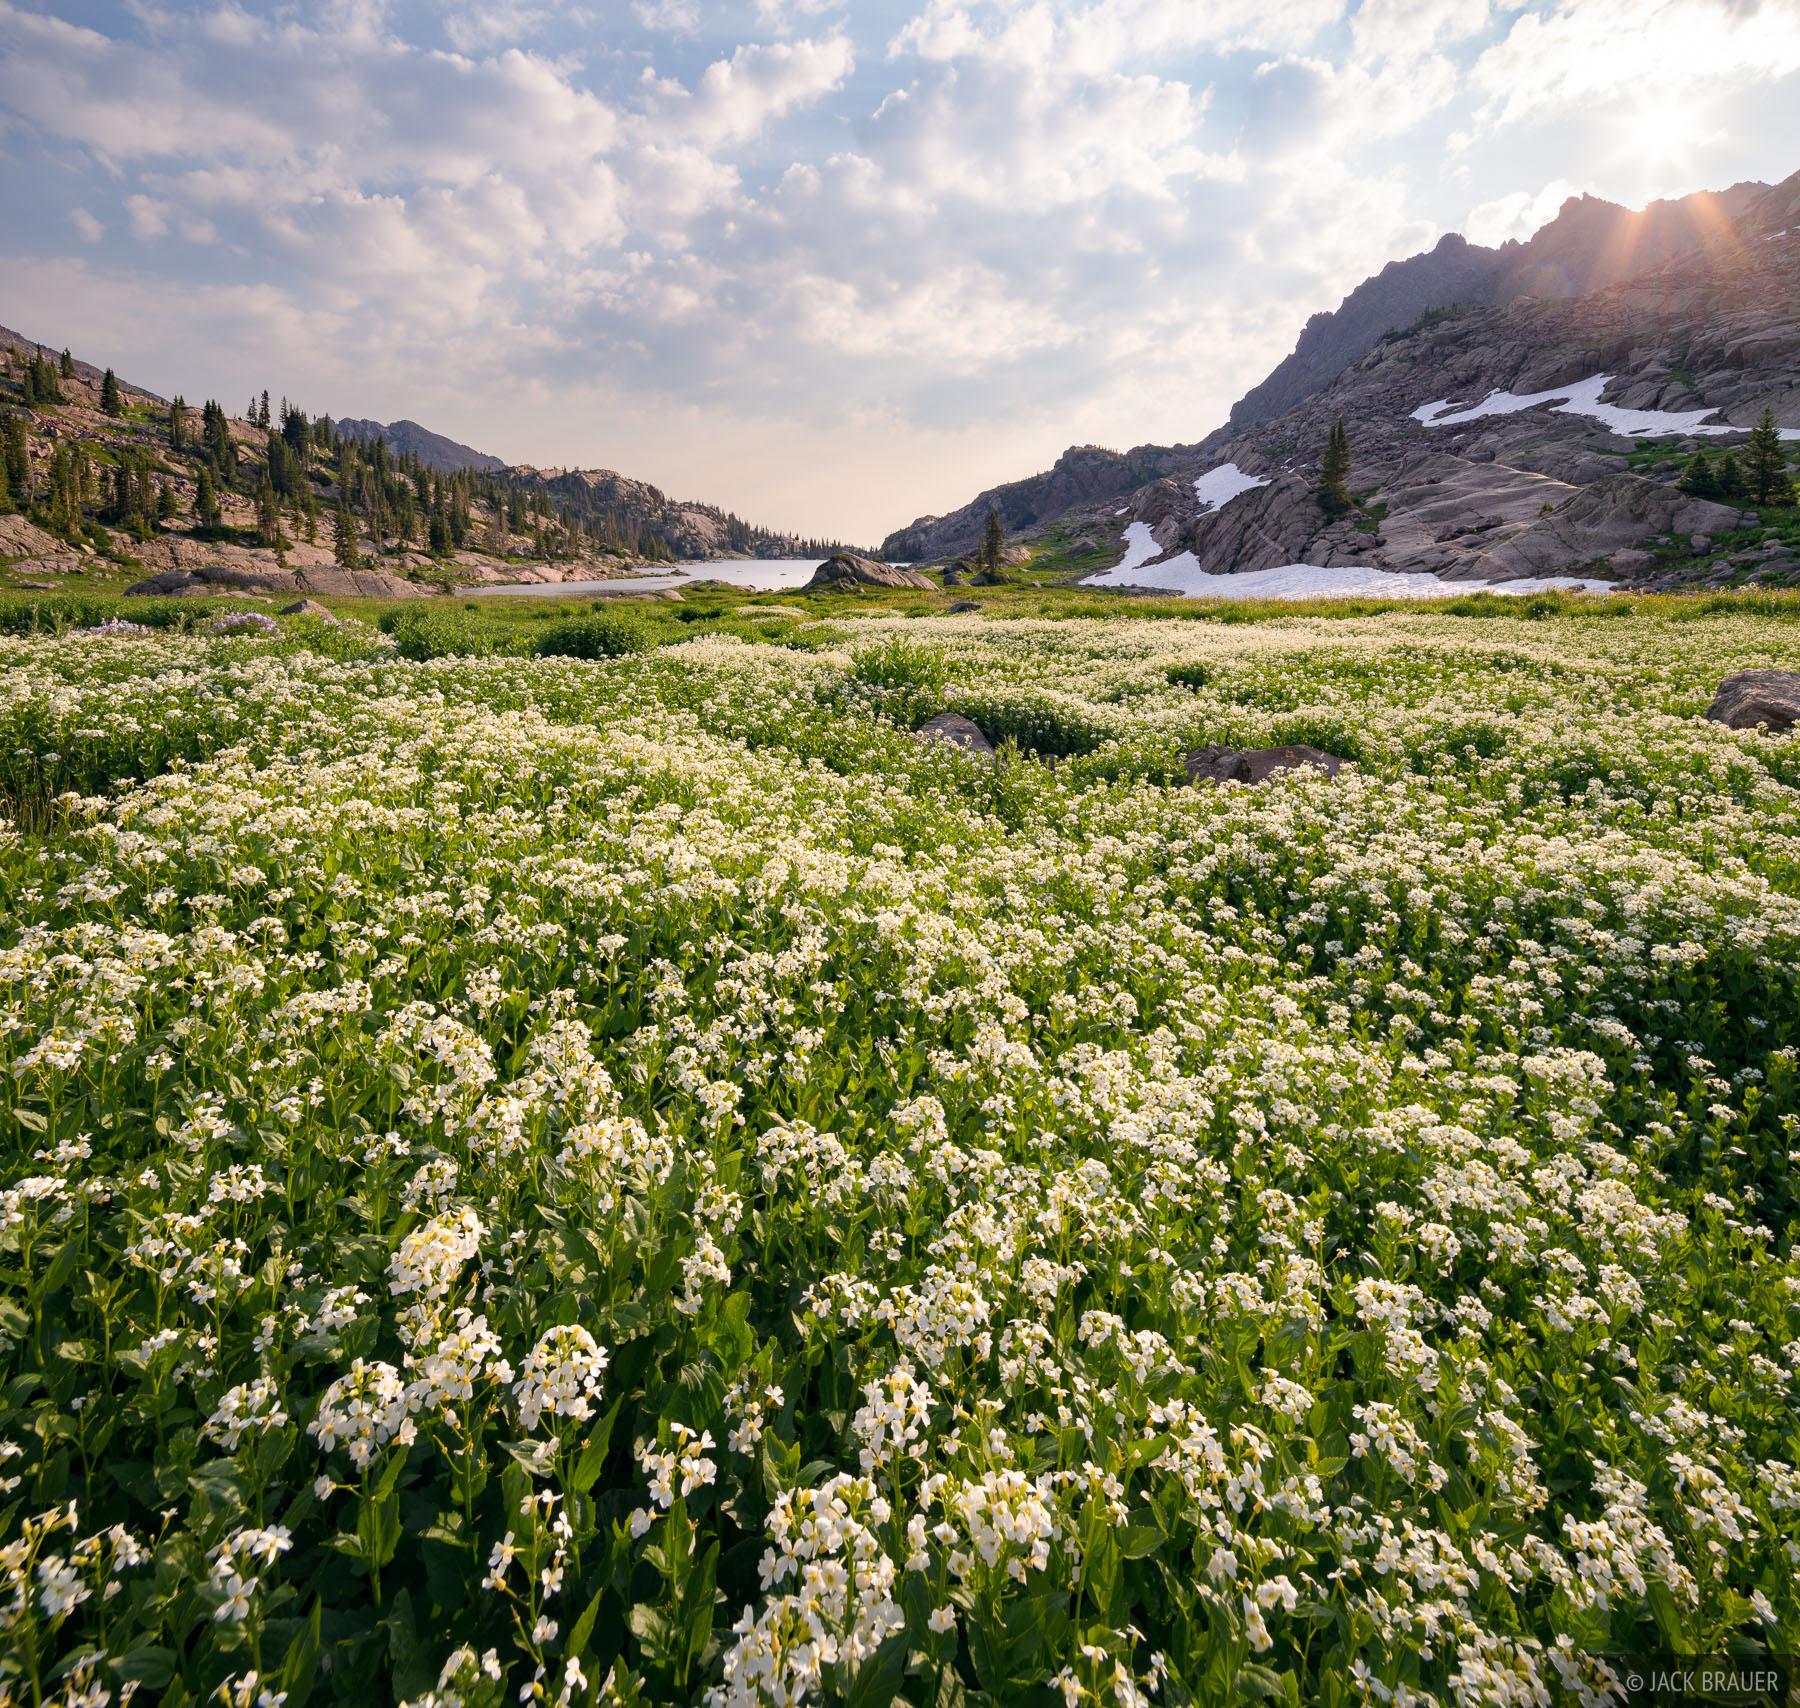 A huge field of Heartleaf Bittercress wildflowers high in the Eagles Nest Wilderness.